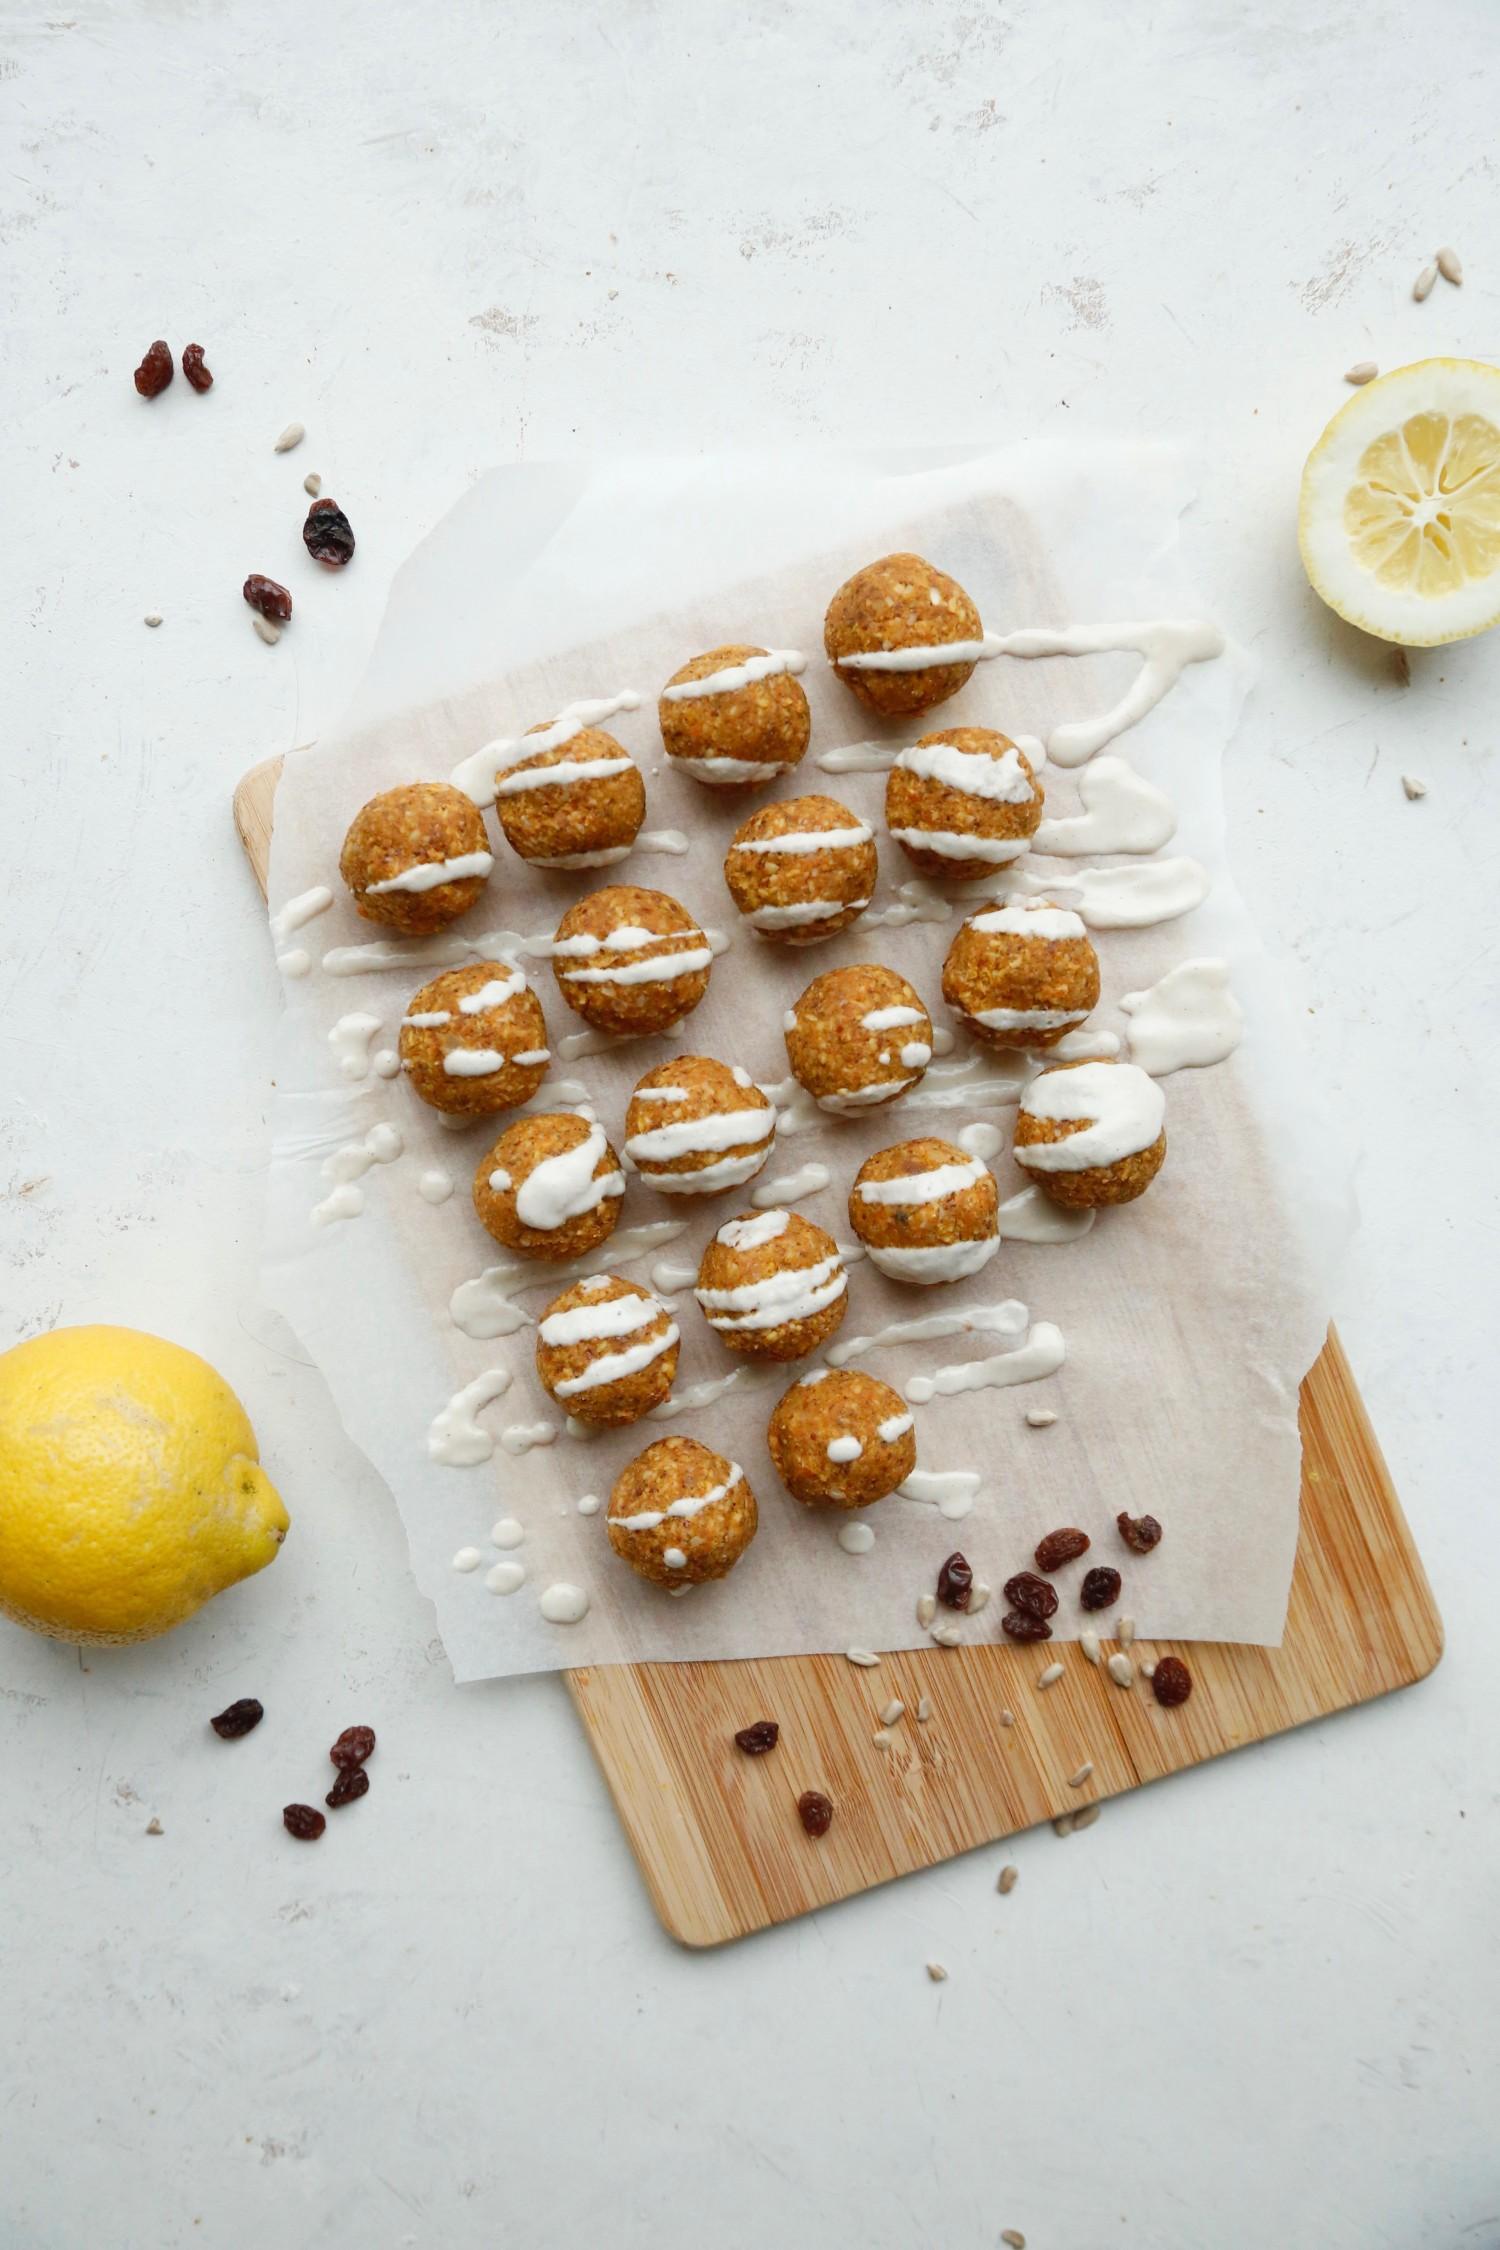 opskrift-sund-gulerodskage-i-snackstoerrelse-3